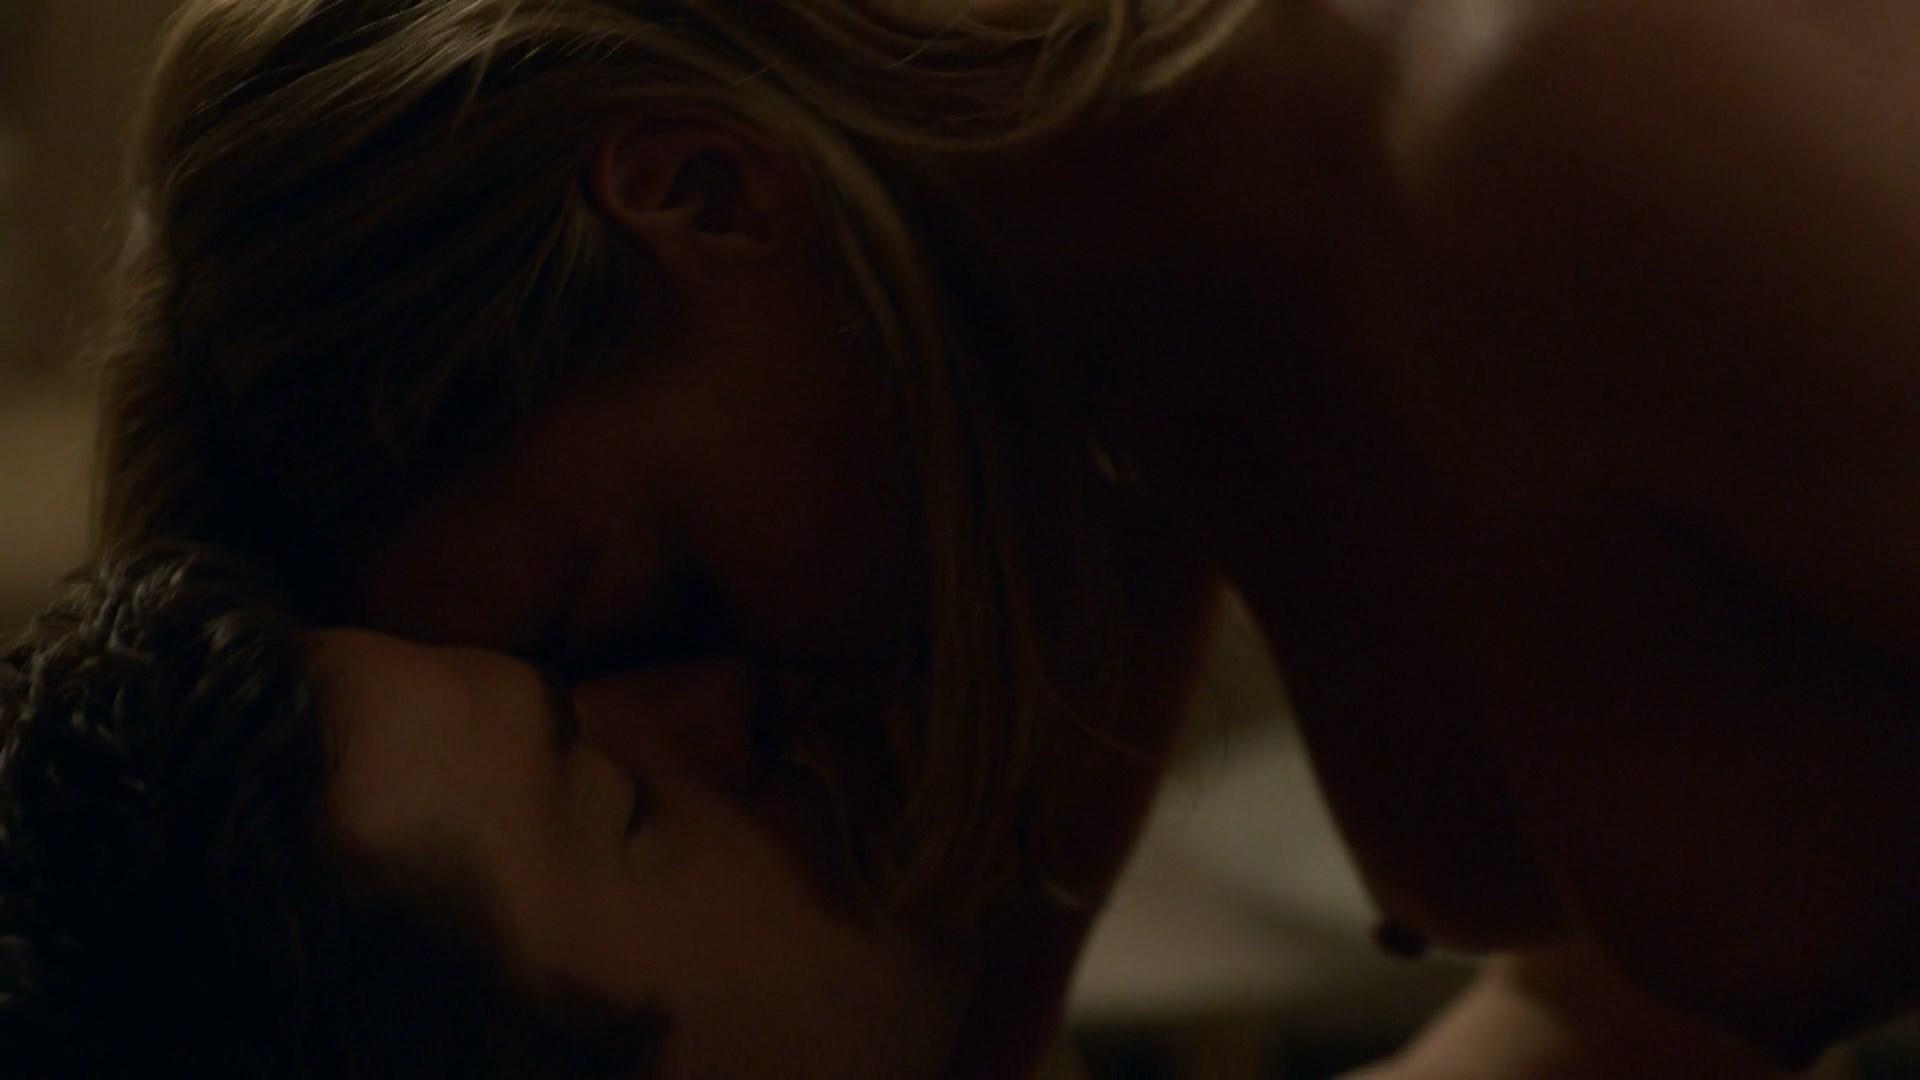 Abbie Cornish nude - Tom Clancy's Jack Ryan s01e04 (2018)